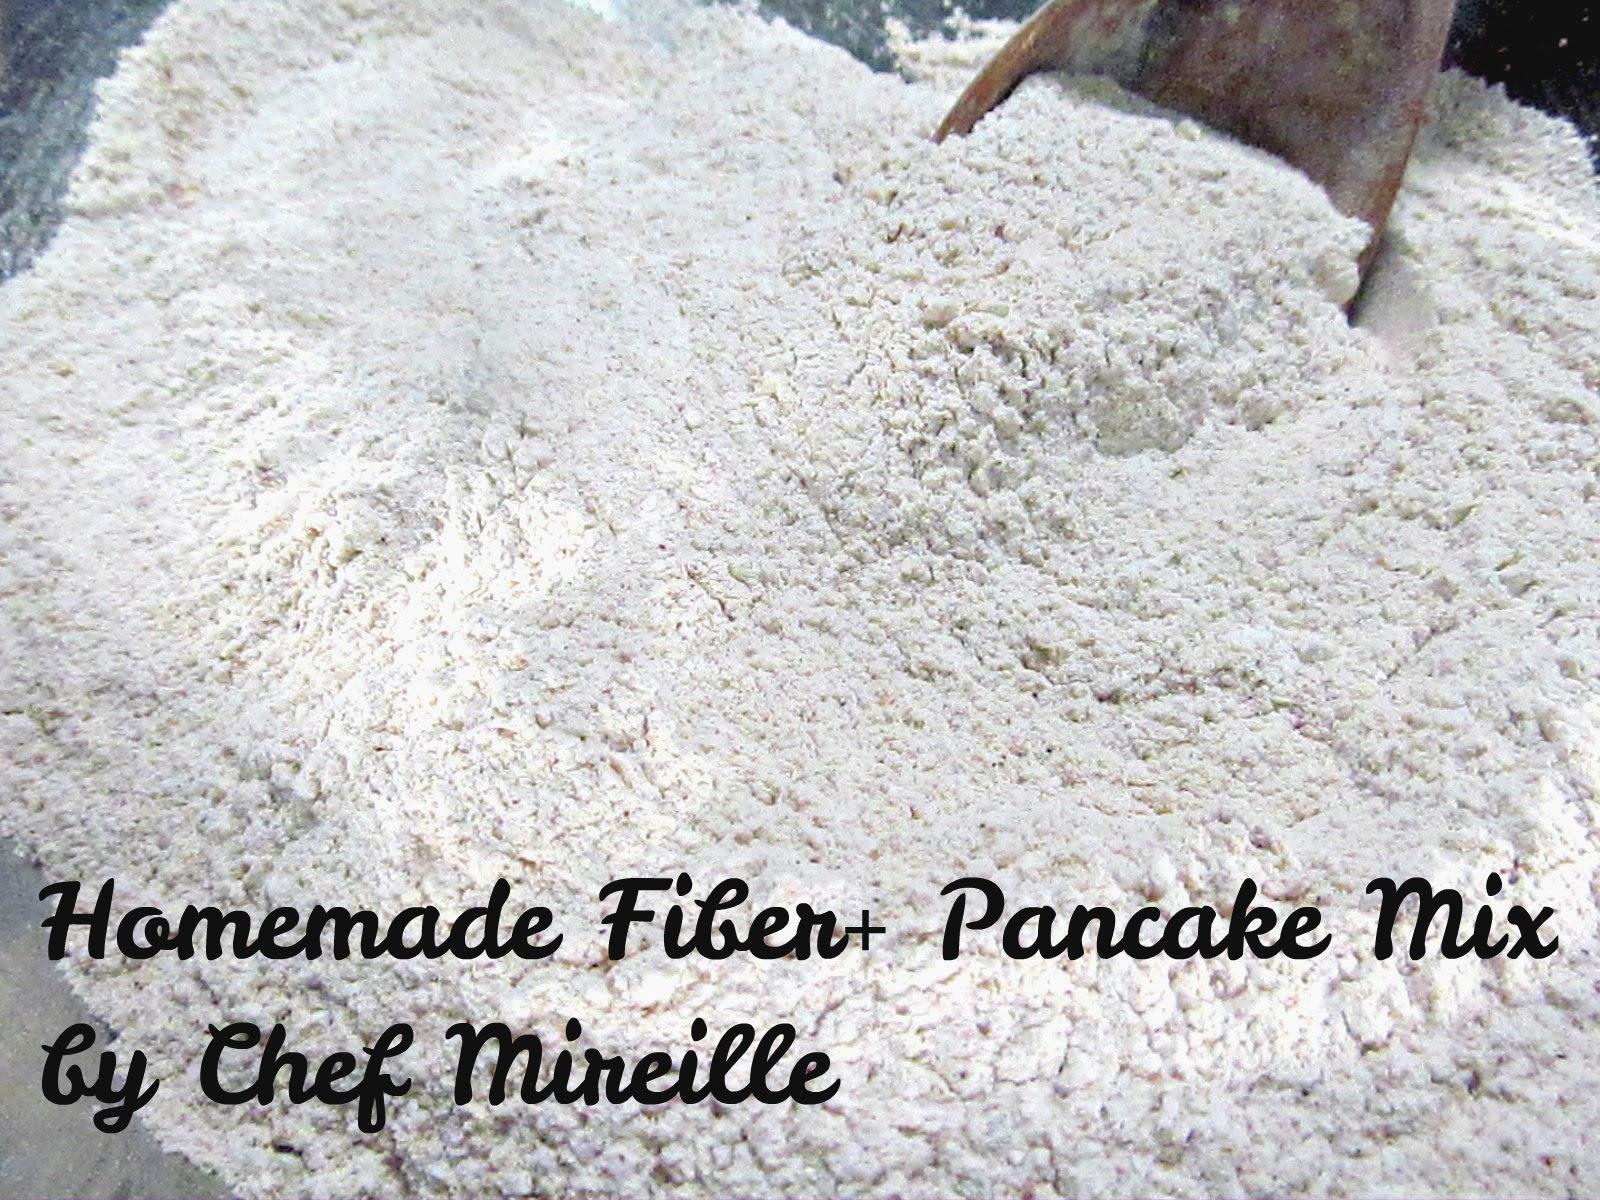 homemade fiber+ pancake mix